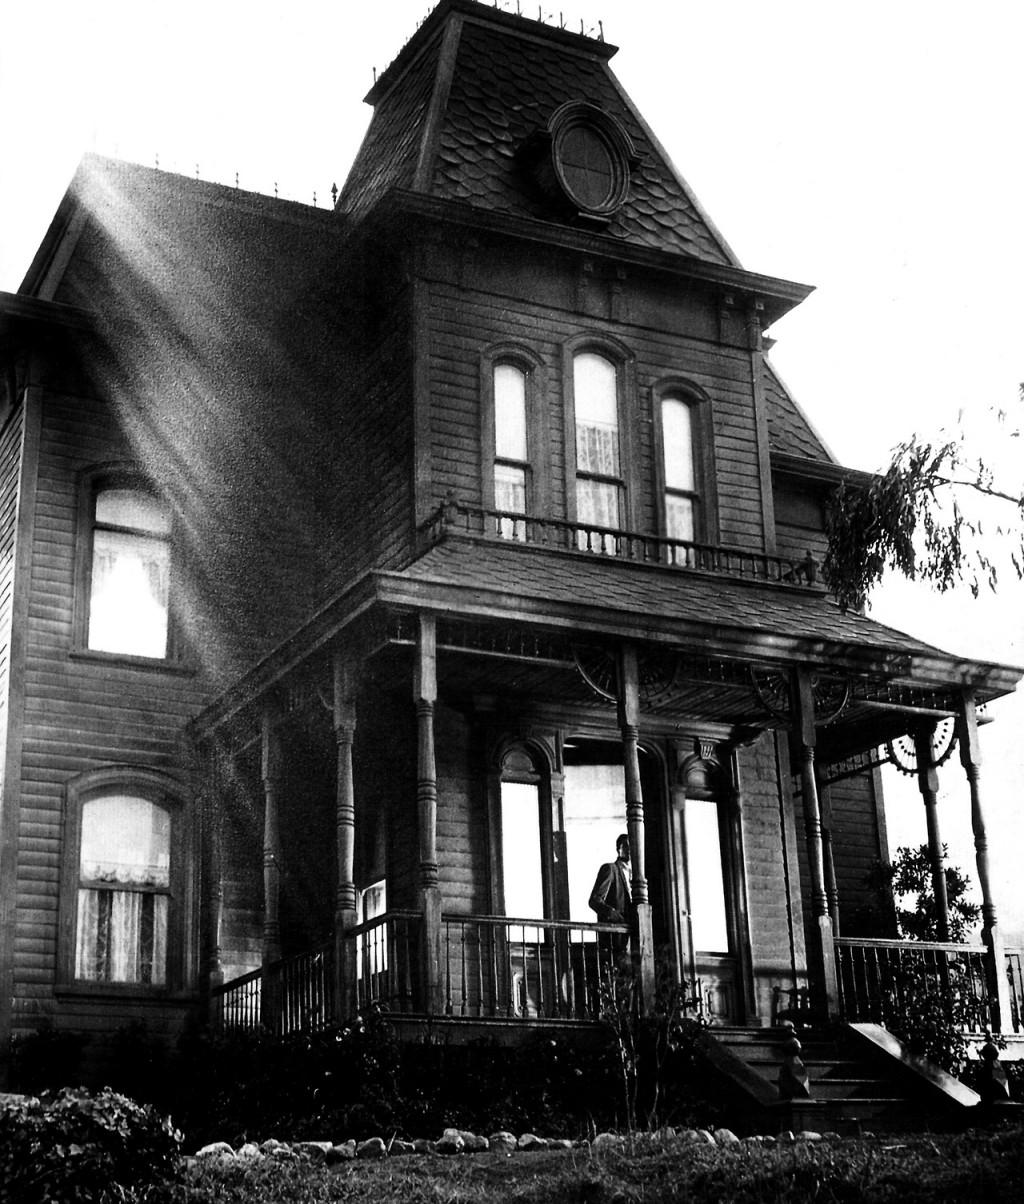 Addams house 2